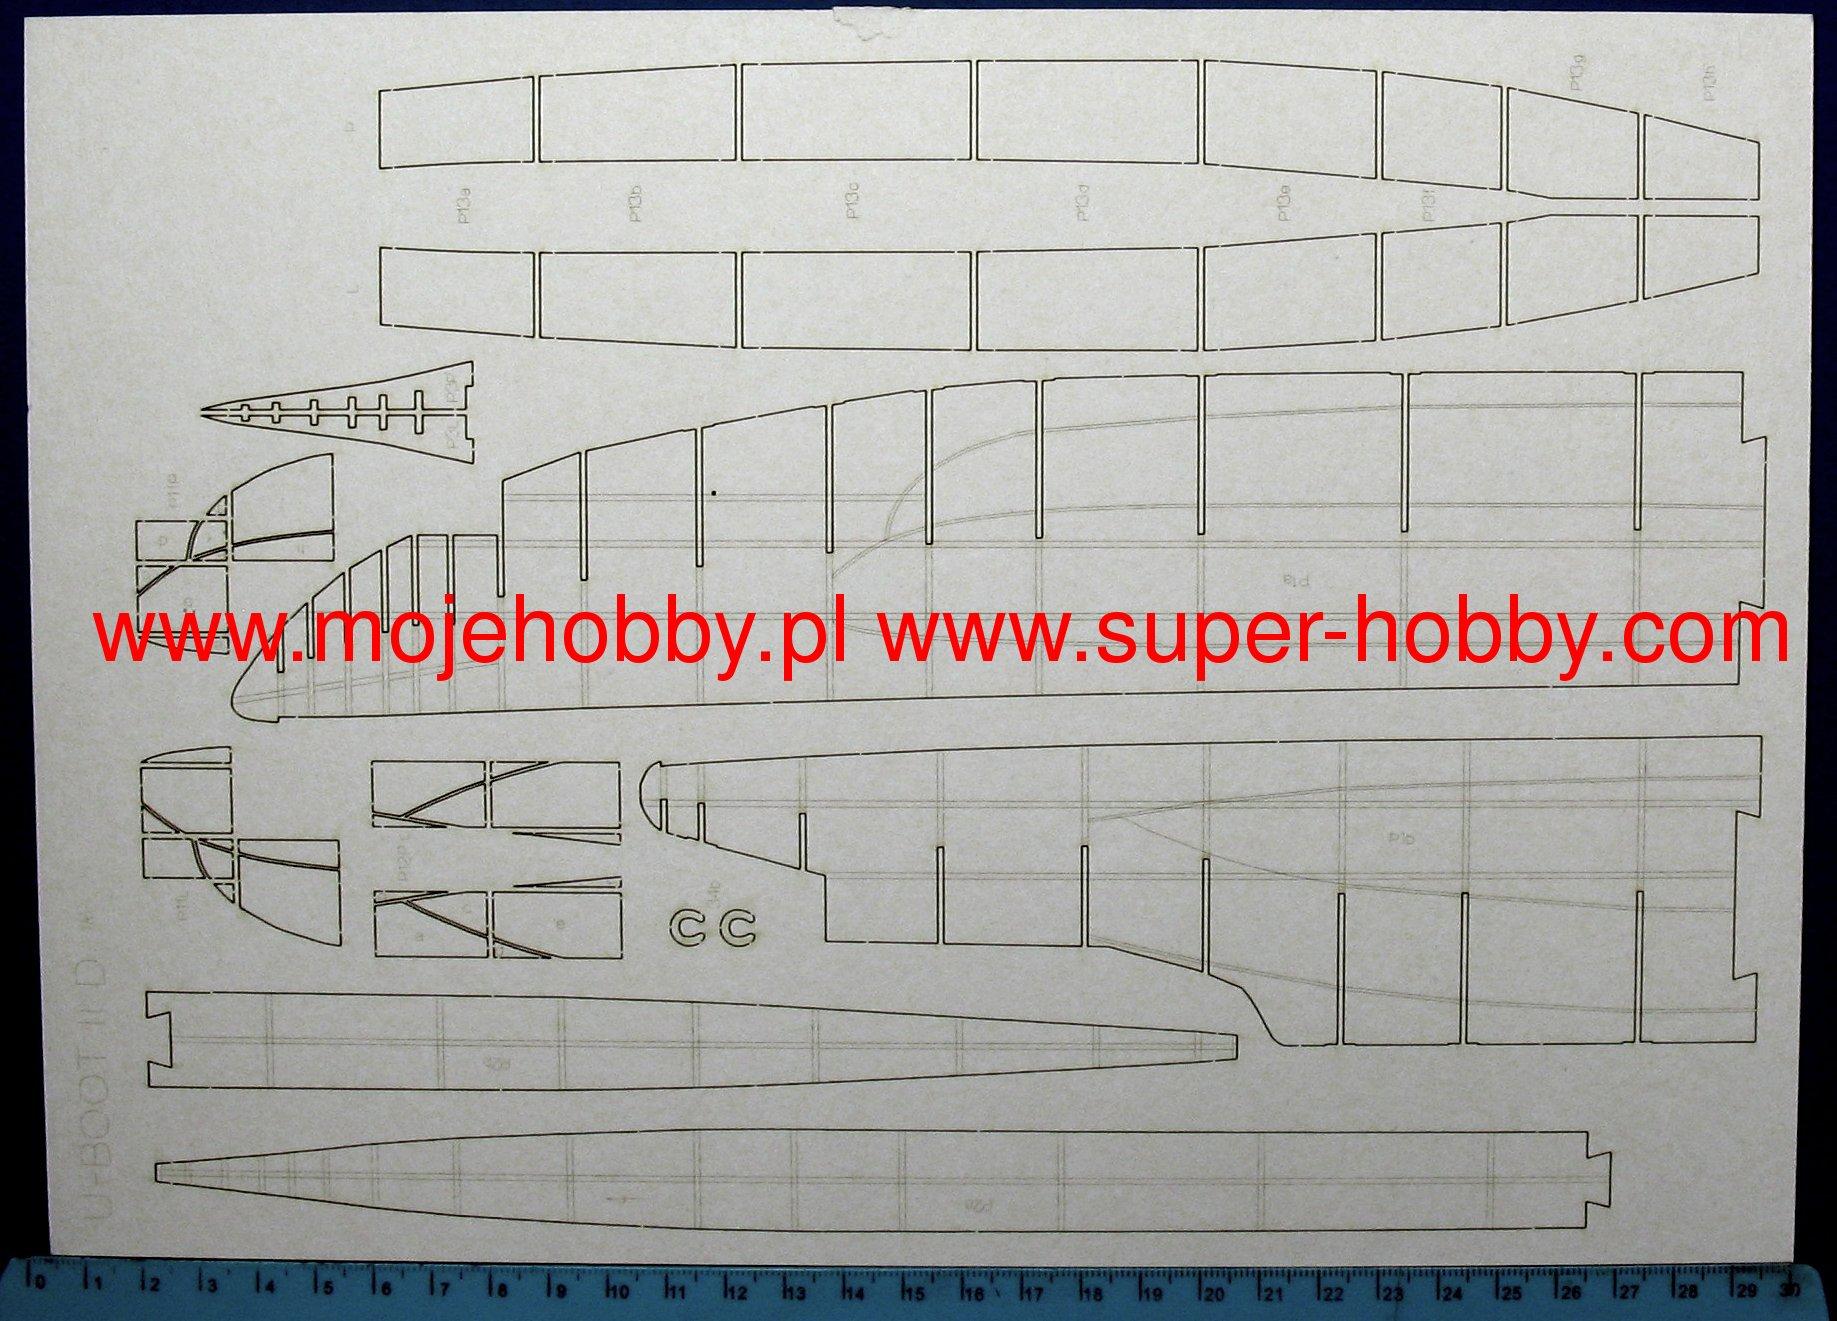 u 141 u boot typ iid zestaw model i wr gi gpm 0346 rh super hobby com 3-Way Switch Wiring Diagram Basic Electrical Schematic Diagrams